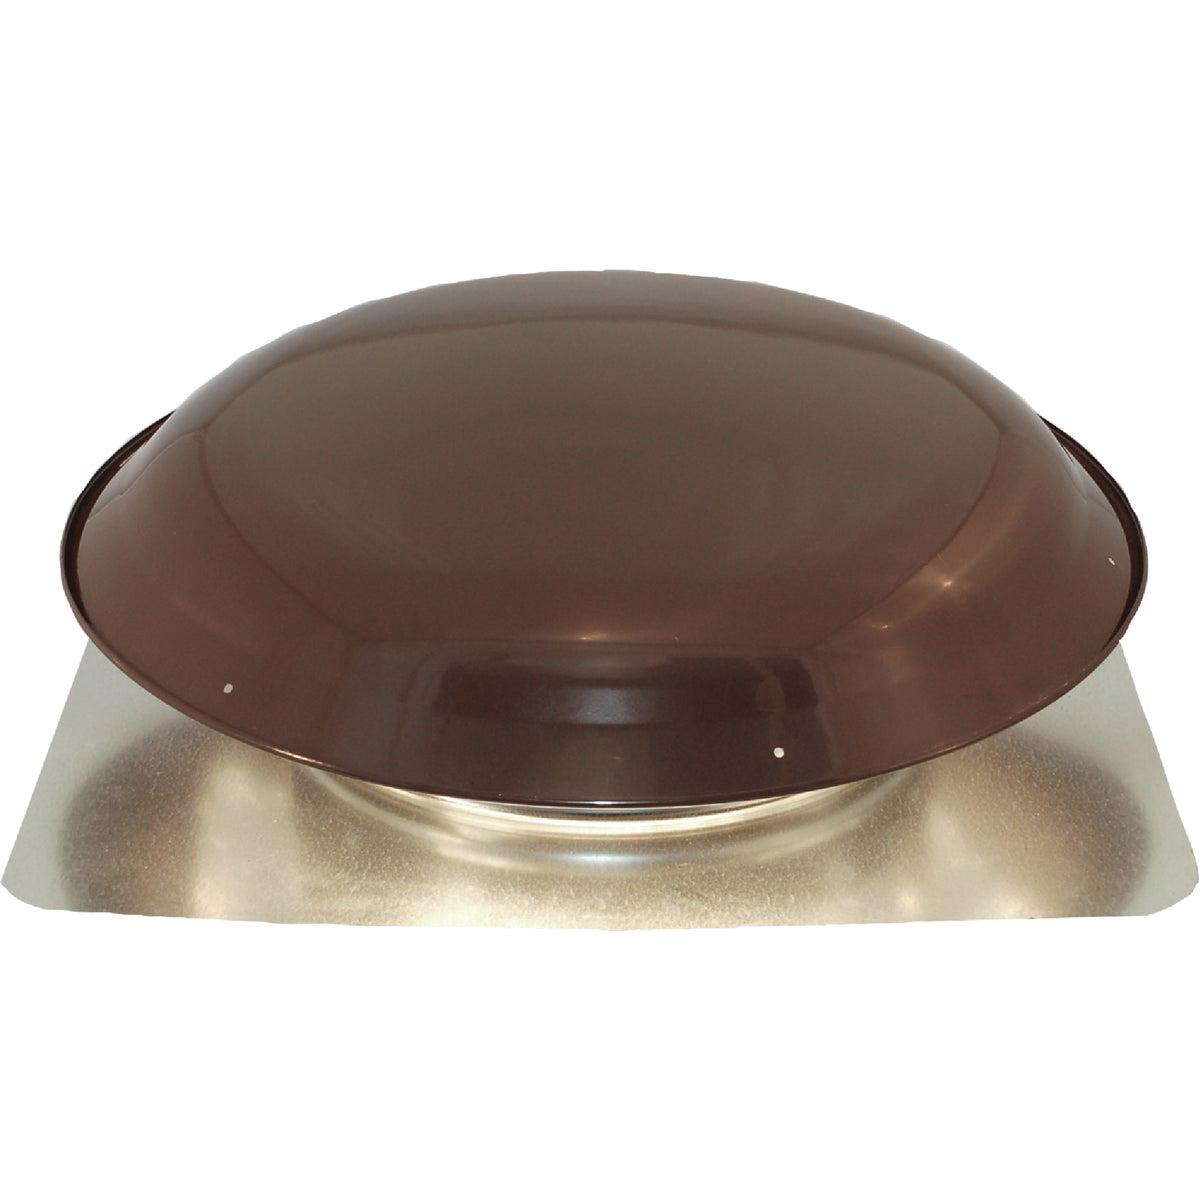 Heavy-Duty Galvanized Steel Dome Roof Mount Attic Vent